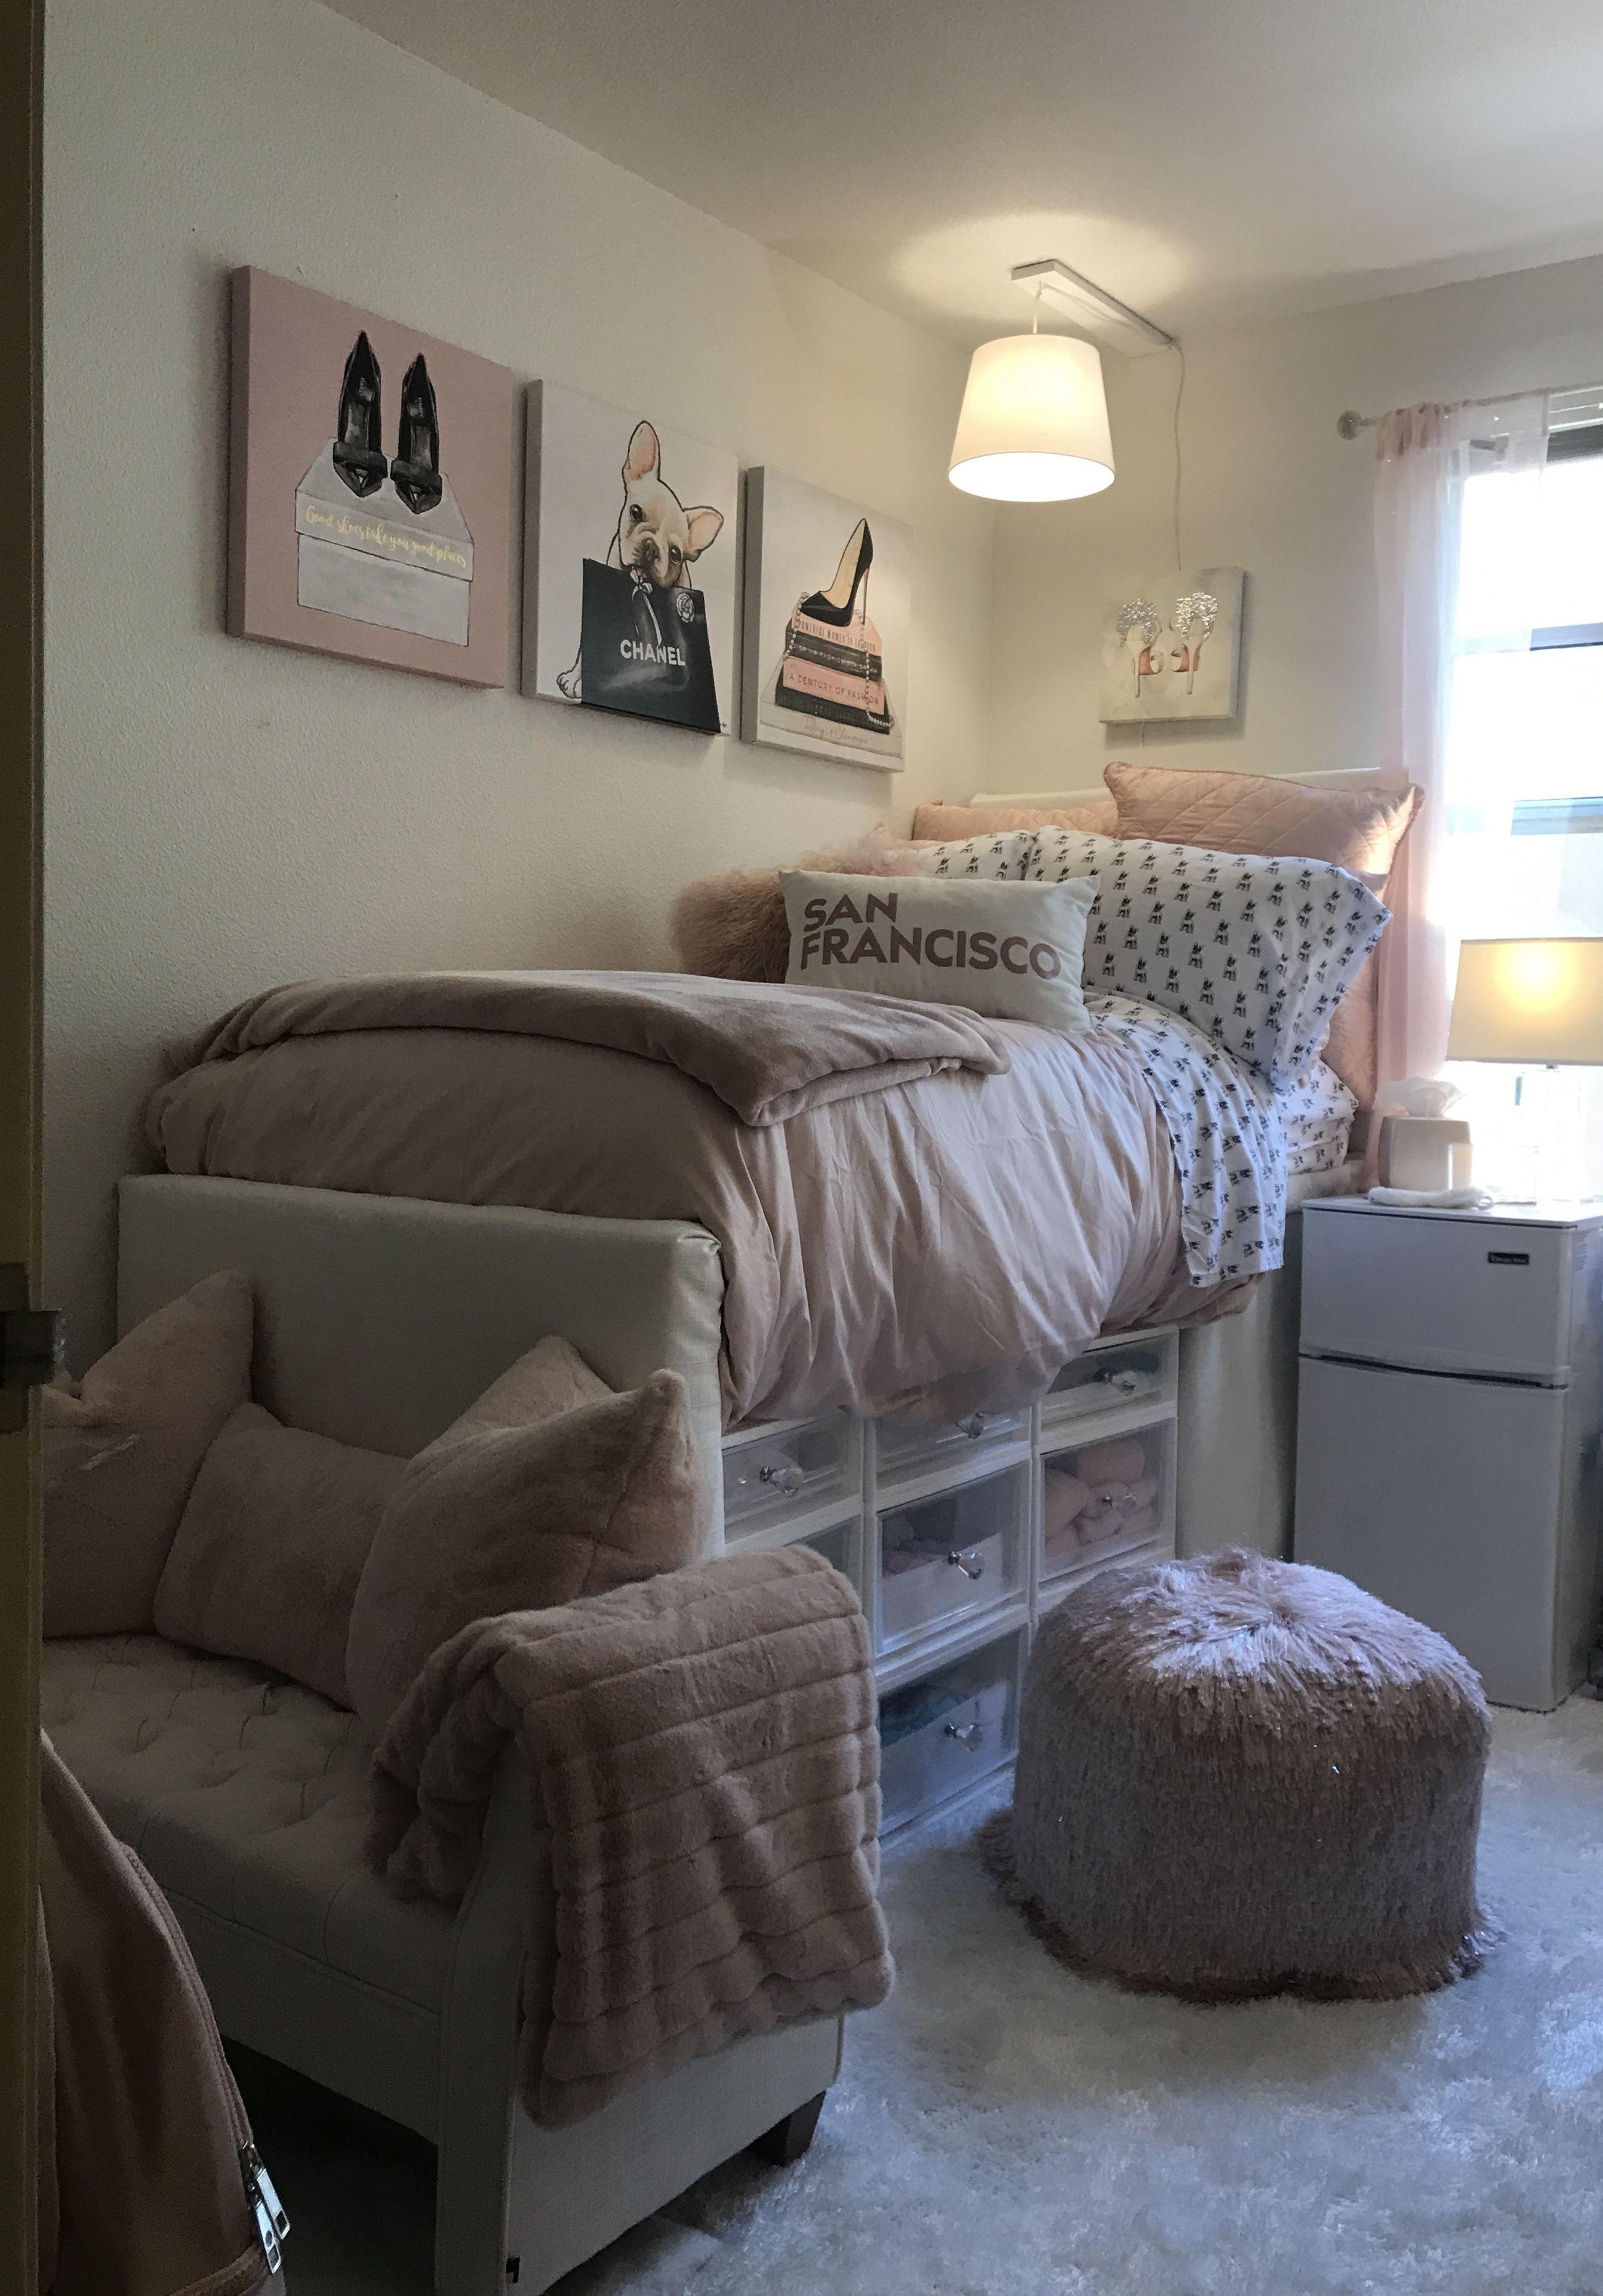 Small Dorm Room Ideas: After Lauren's Dorm Room Transformation